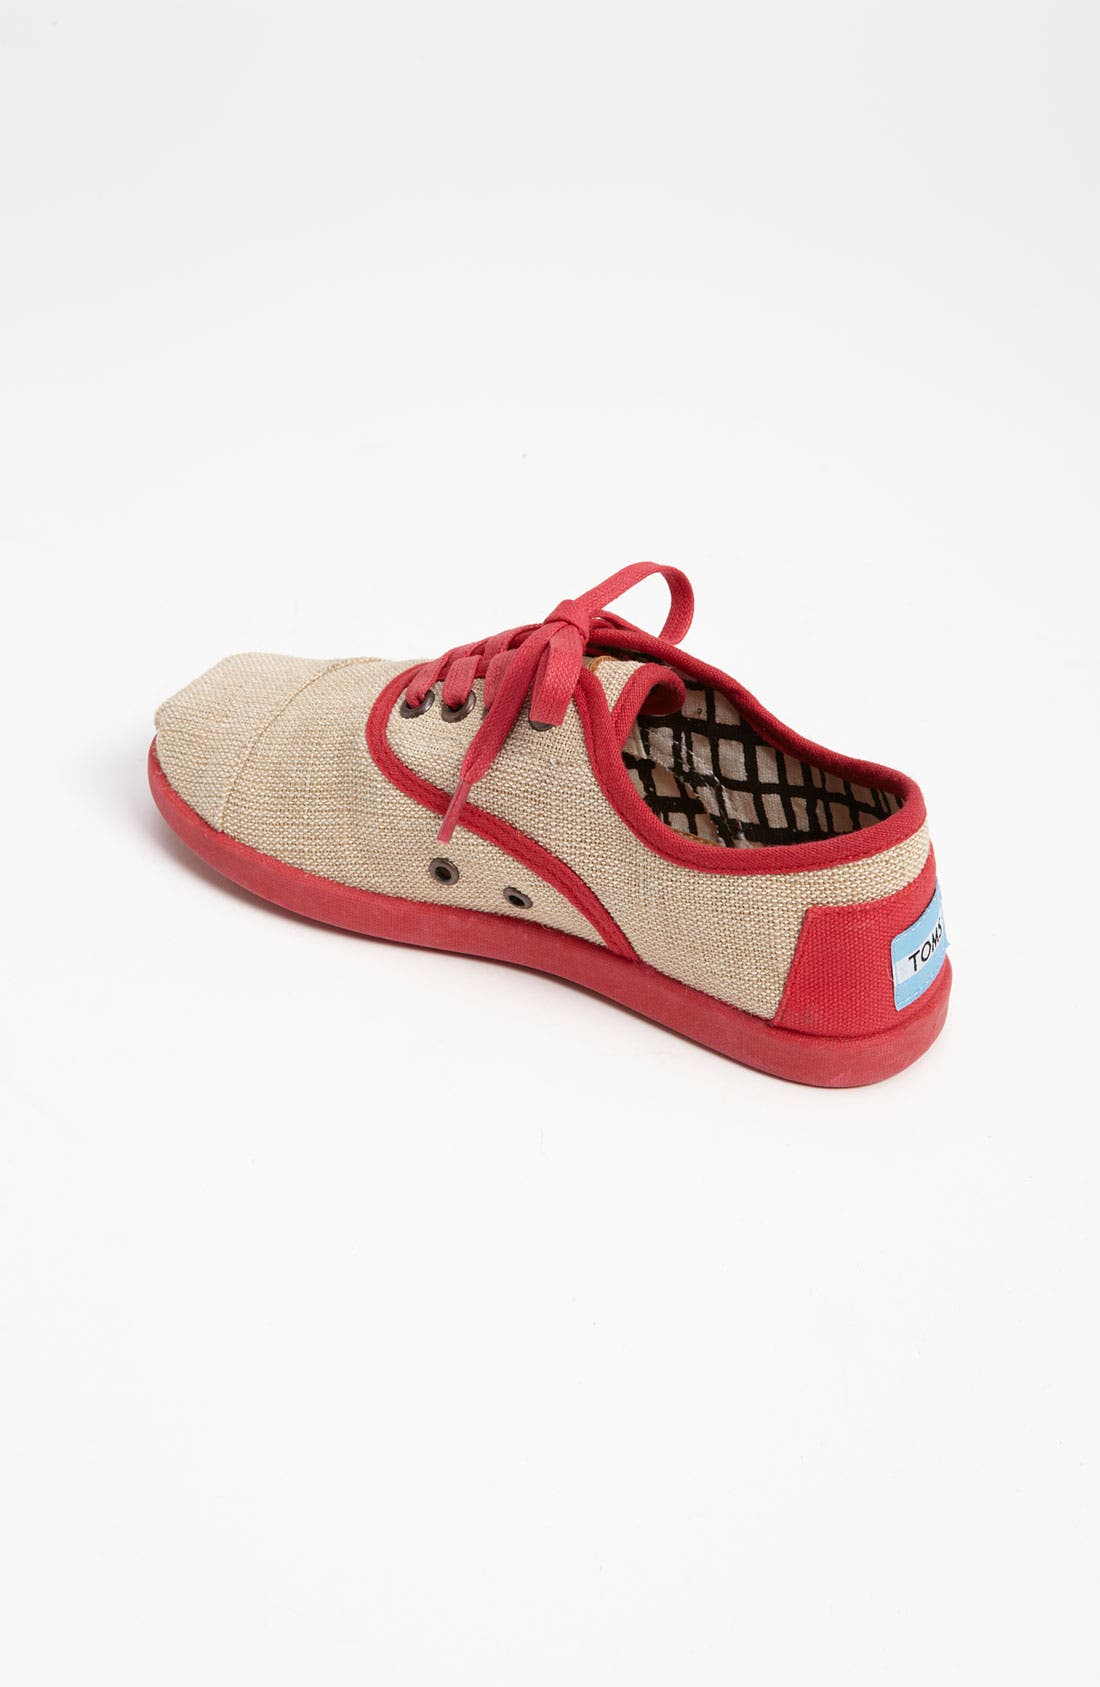 Alternate Image 2  - TOMS 'Cordones Youth - Maddox' Burlap Sneaker (Toddler, Little Kid & Big Kid)